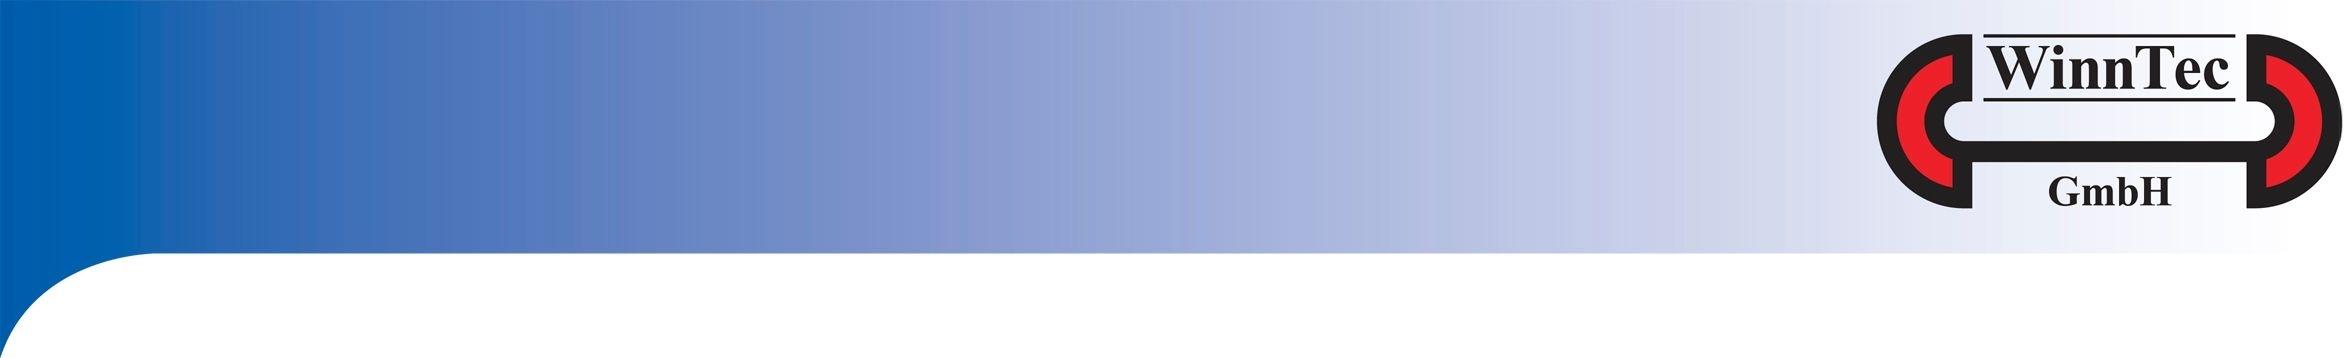 Logo WinnTec GmbH